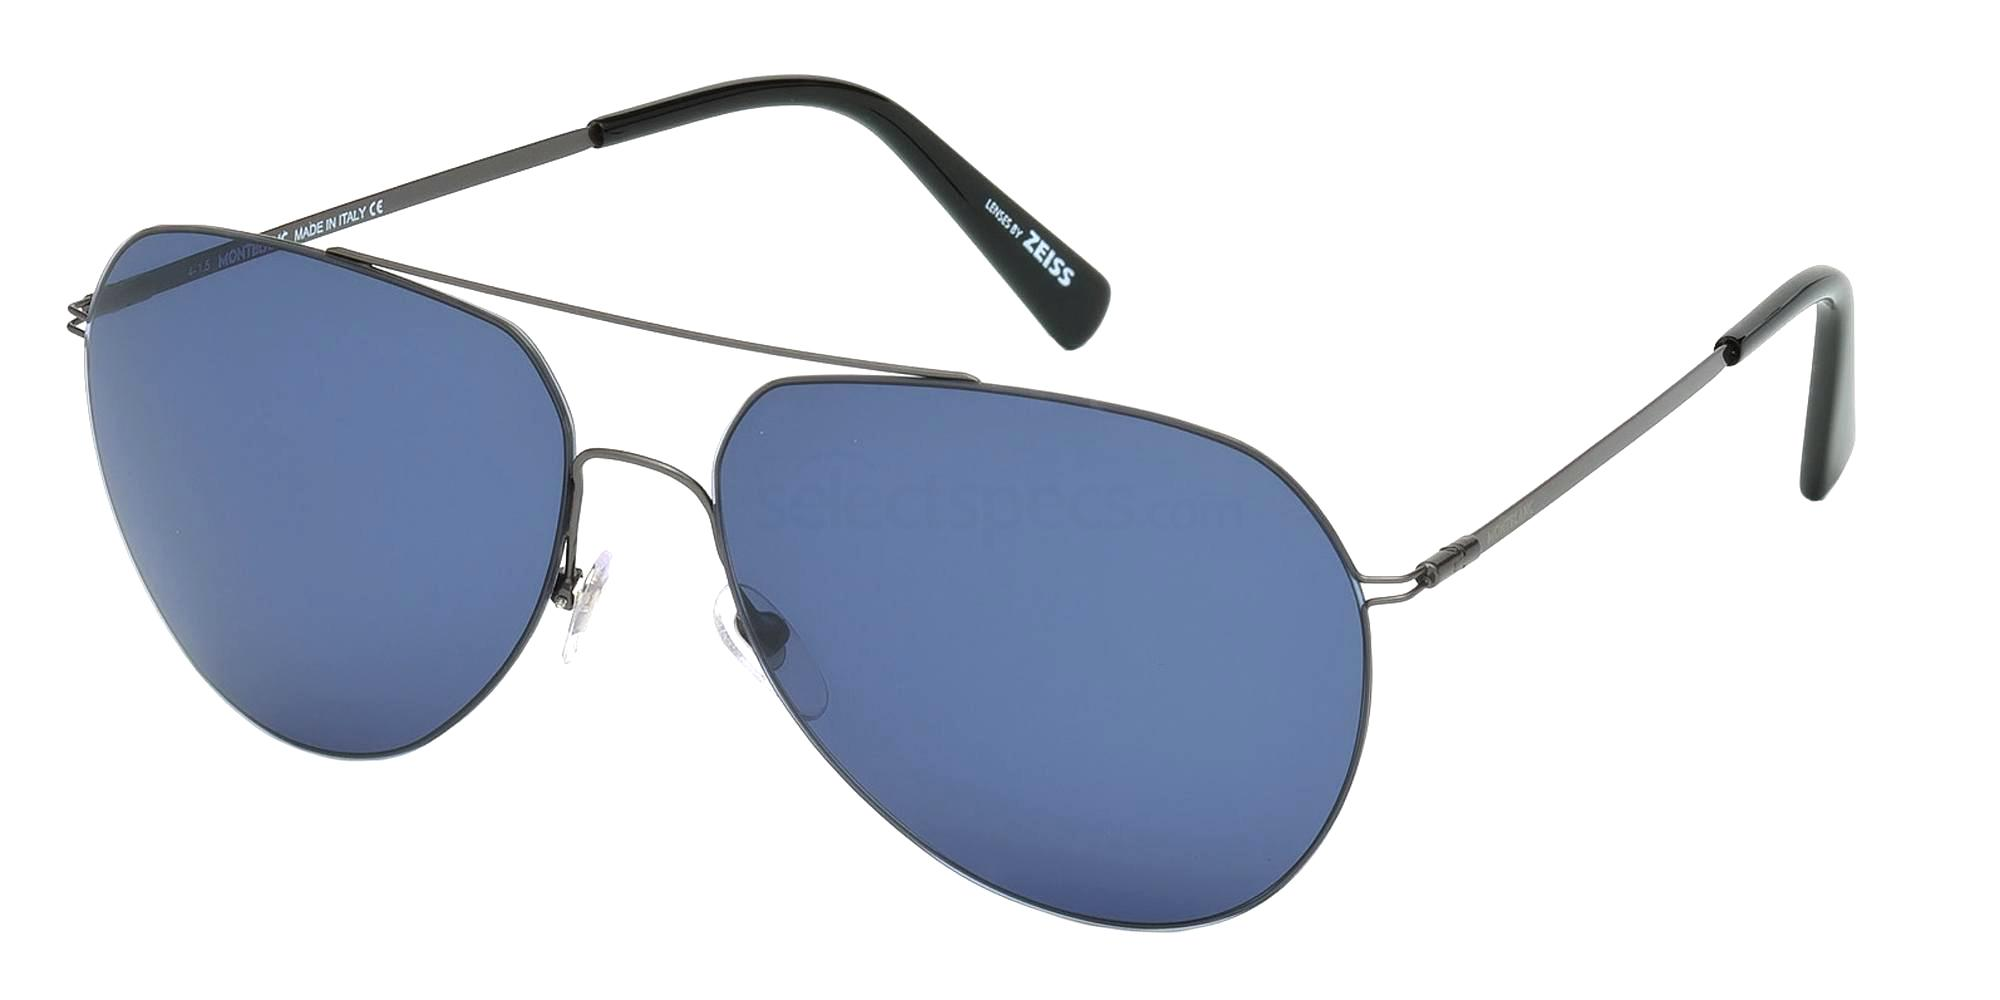 08V MB595S Sunglasses, Mont Blanc